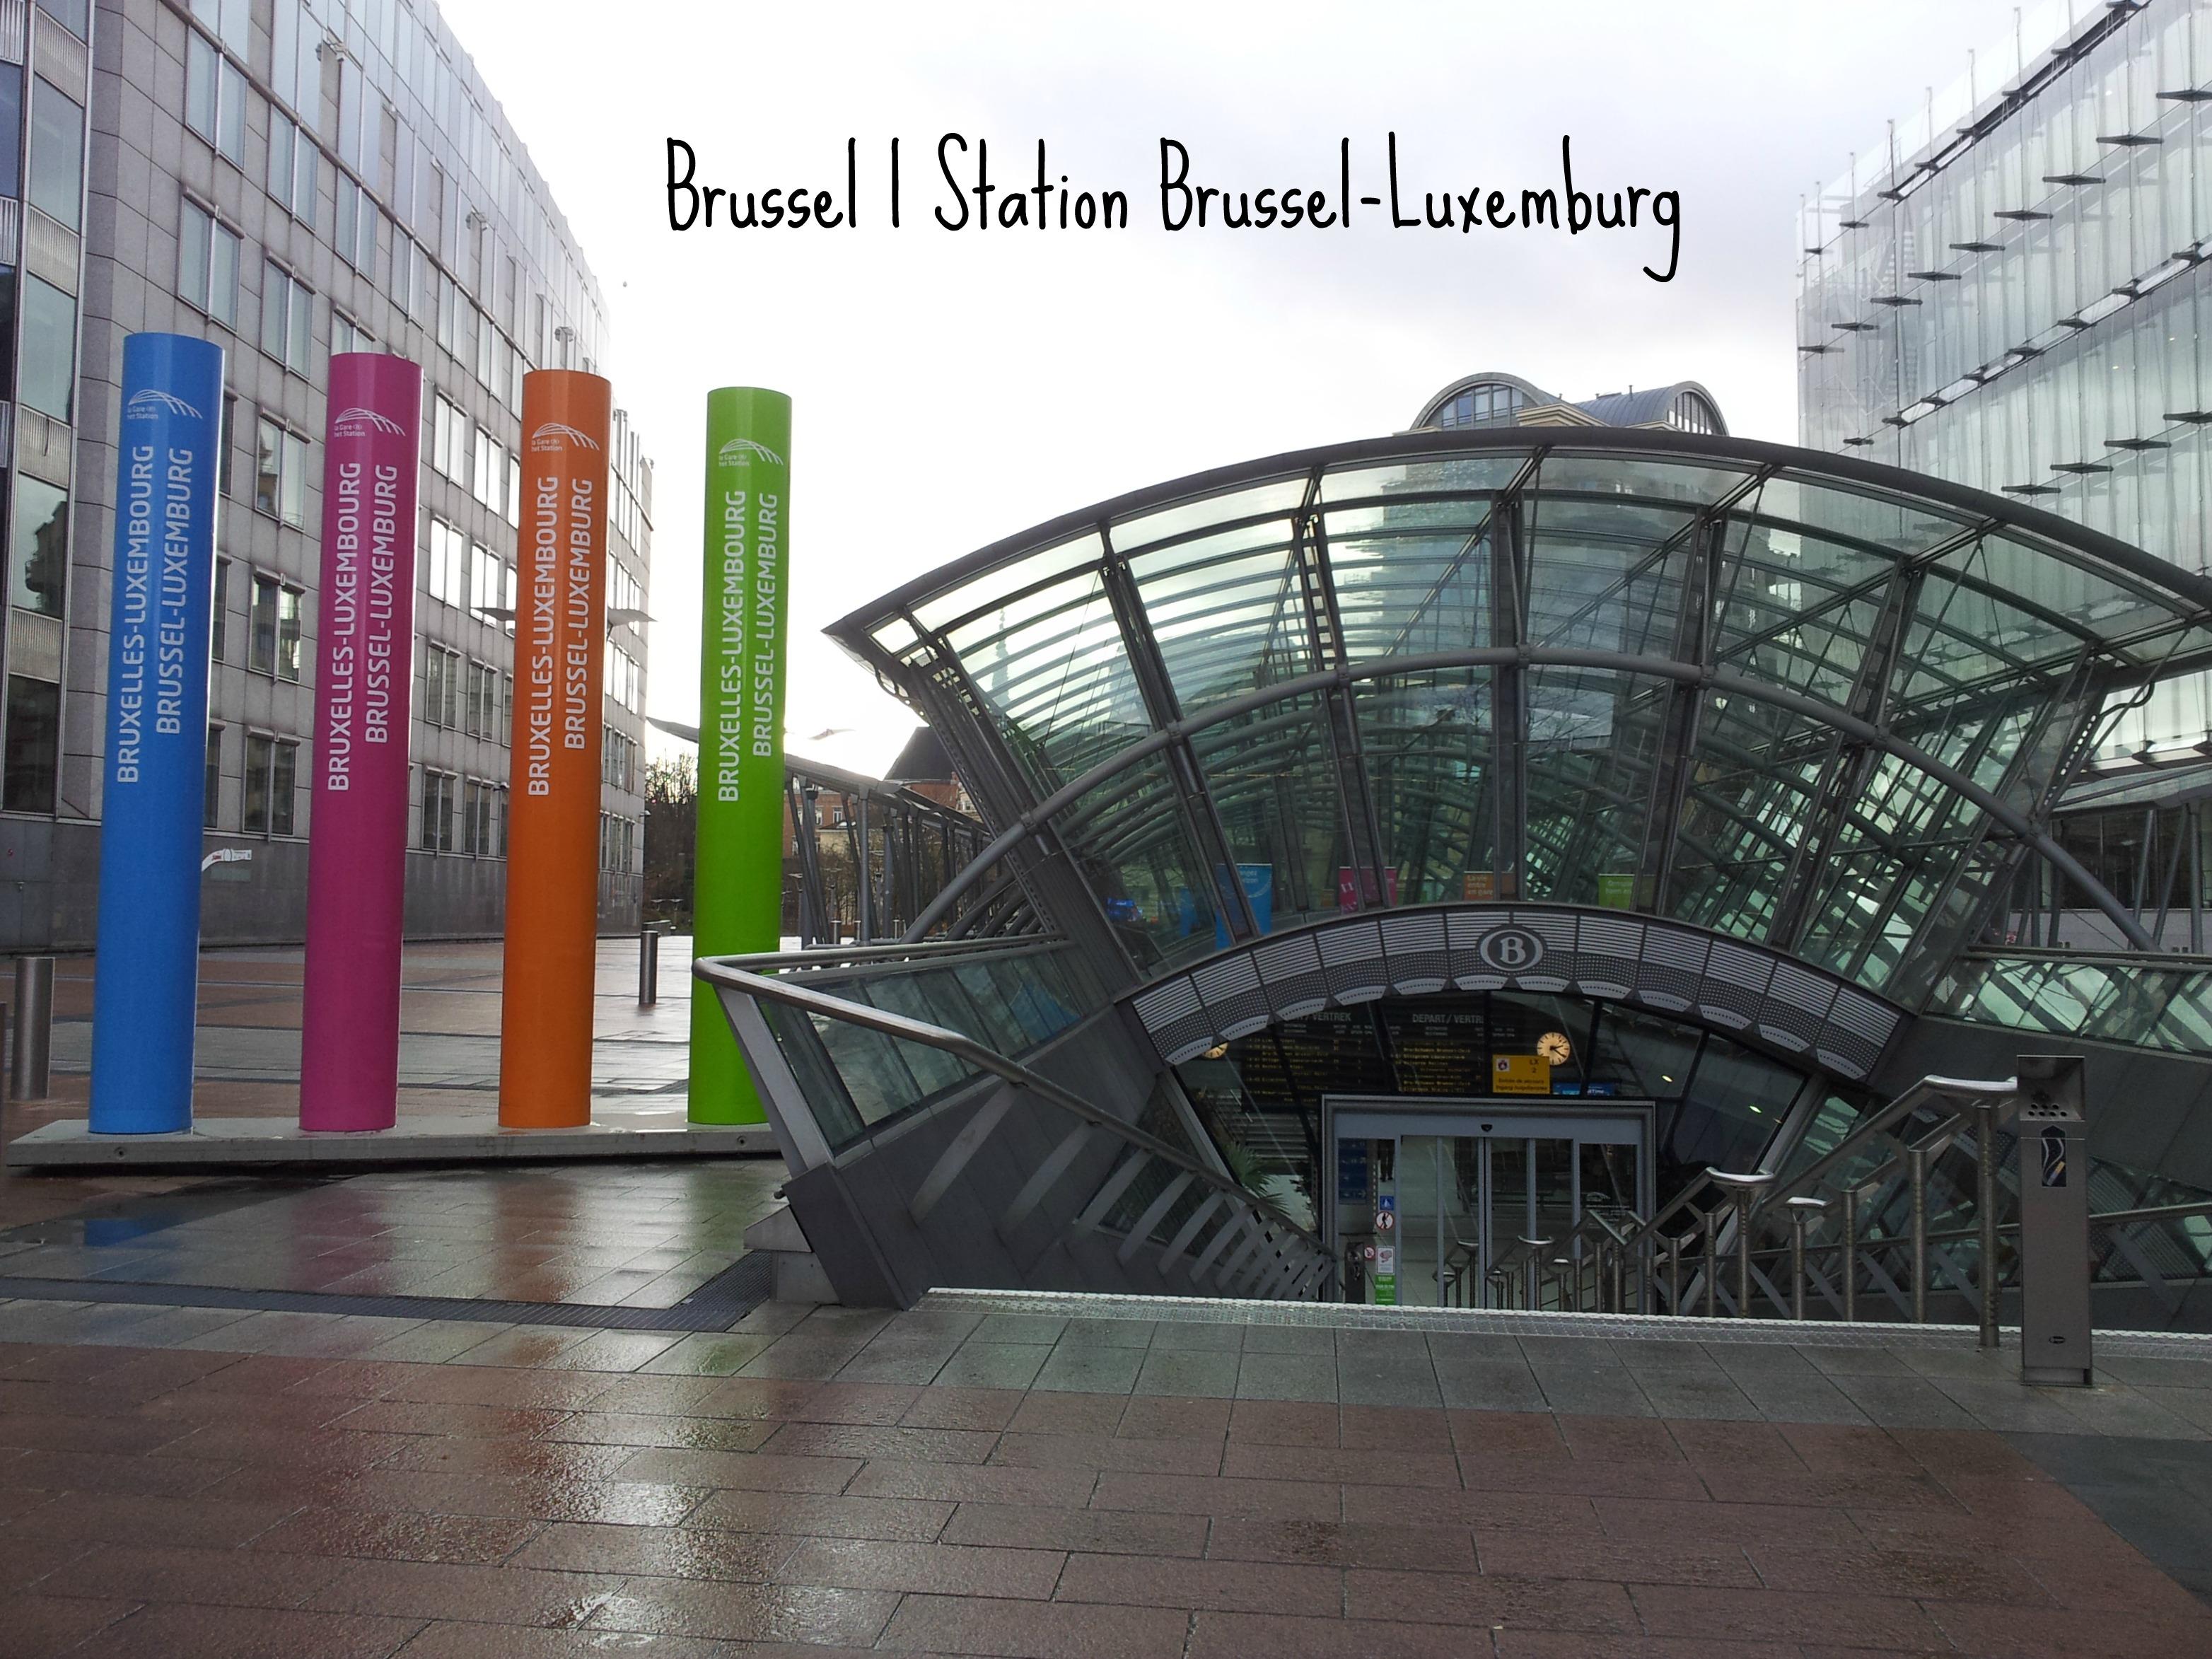 Brussel-Luxemburg